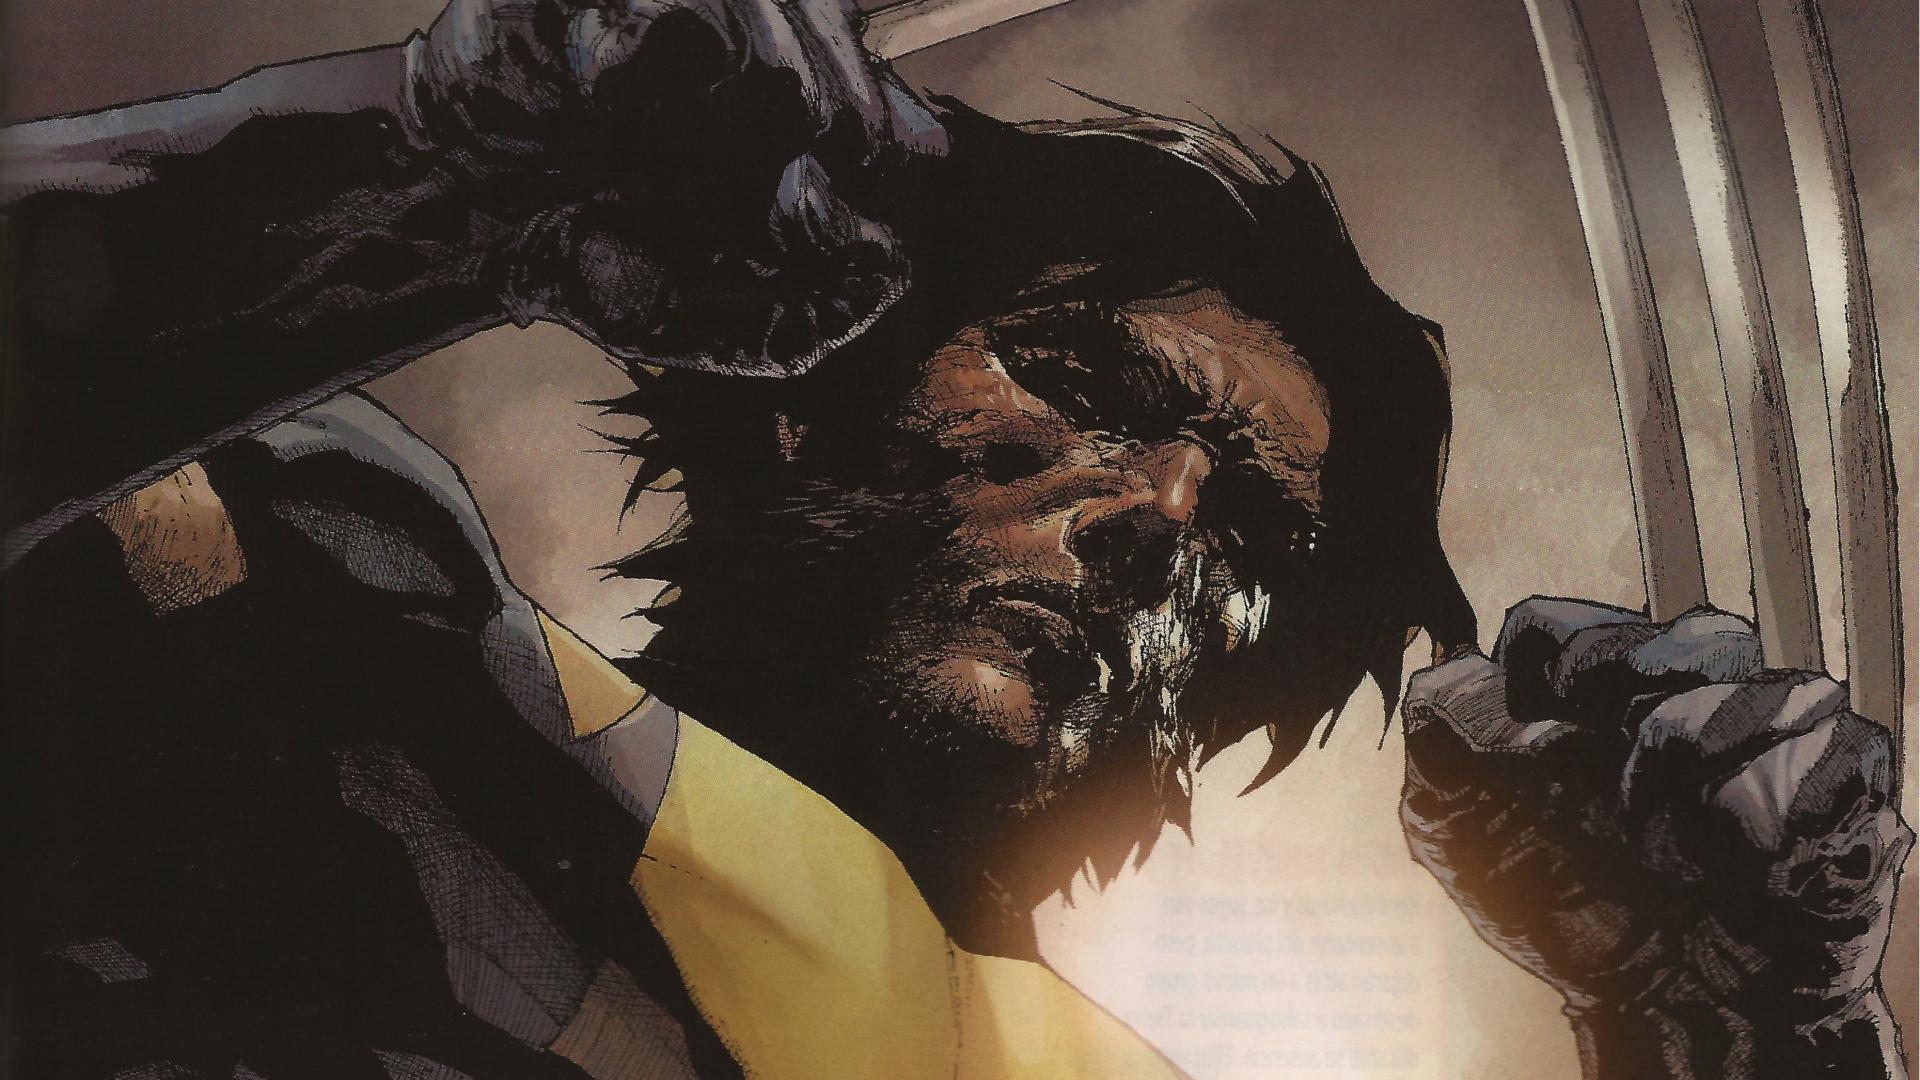 Download 1920x1080 Wallpaper Wolverine Superhero X Men Marvel